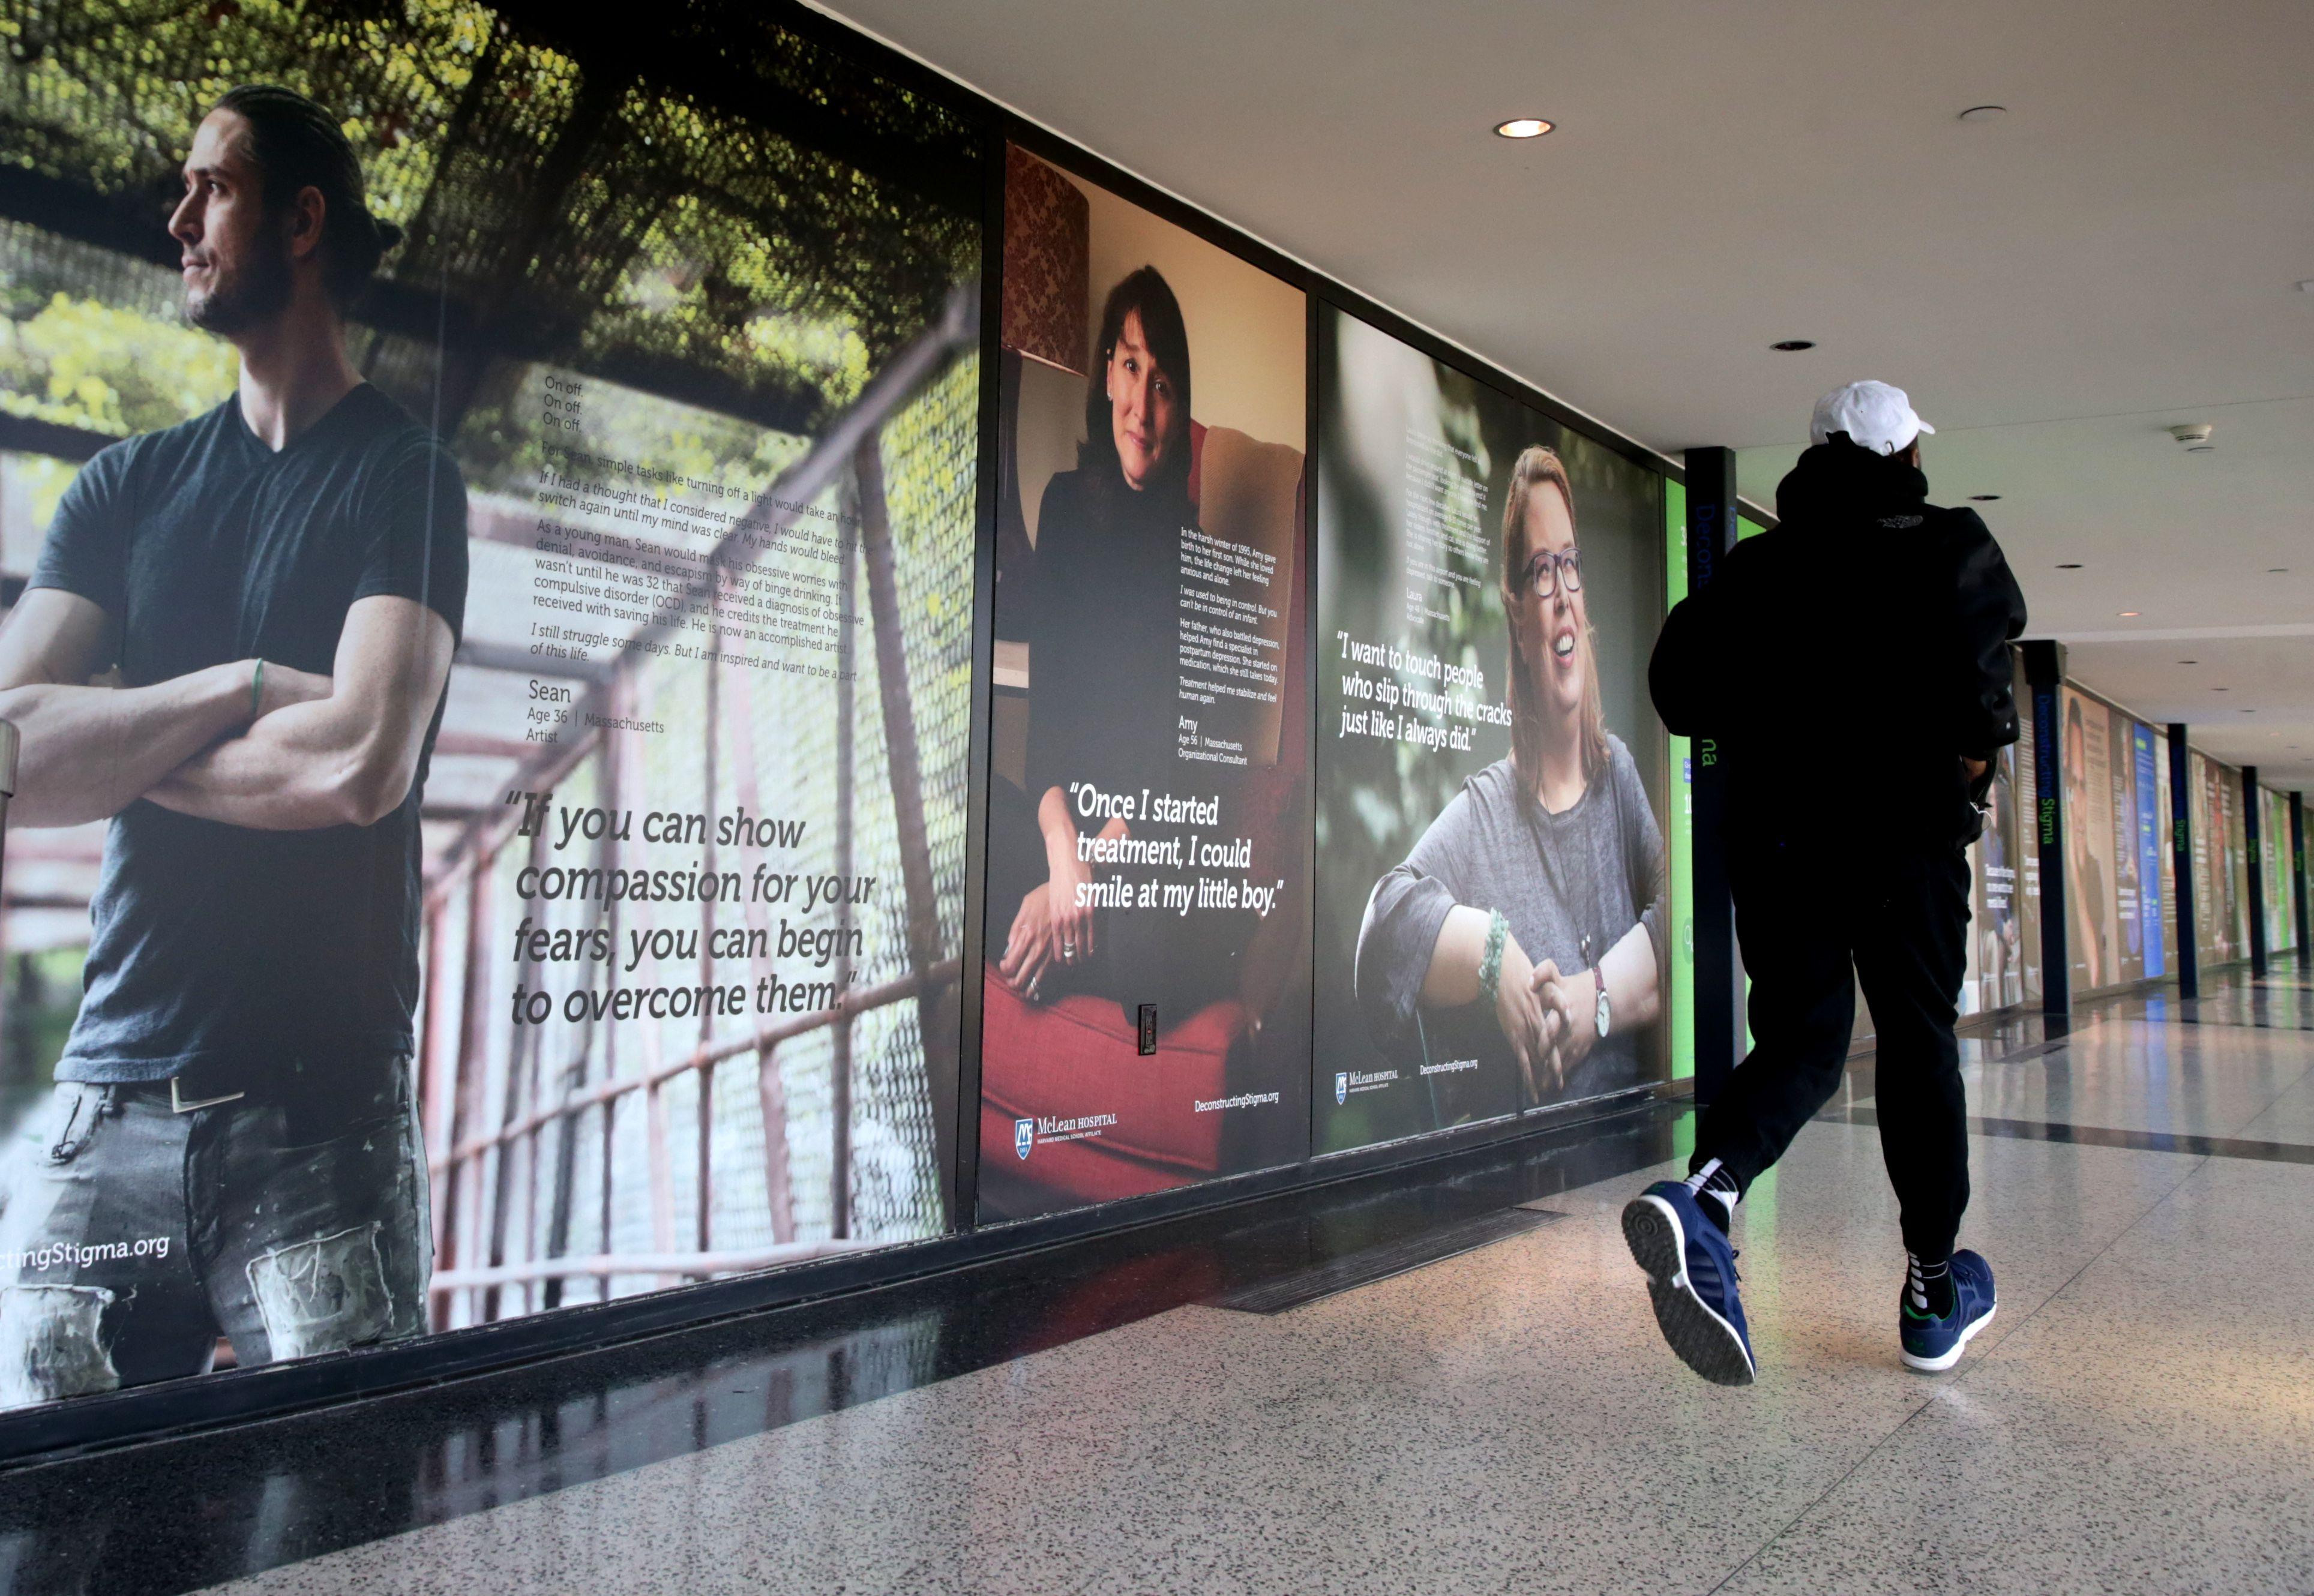 Flying away from stigma: Logan exhibit displays stories of